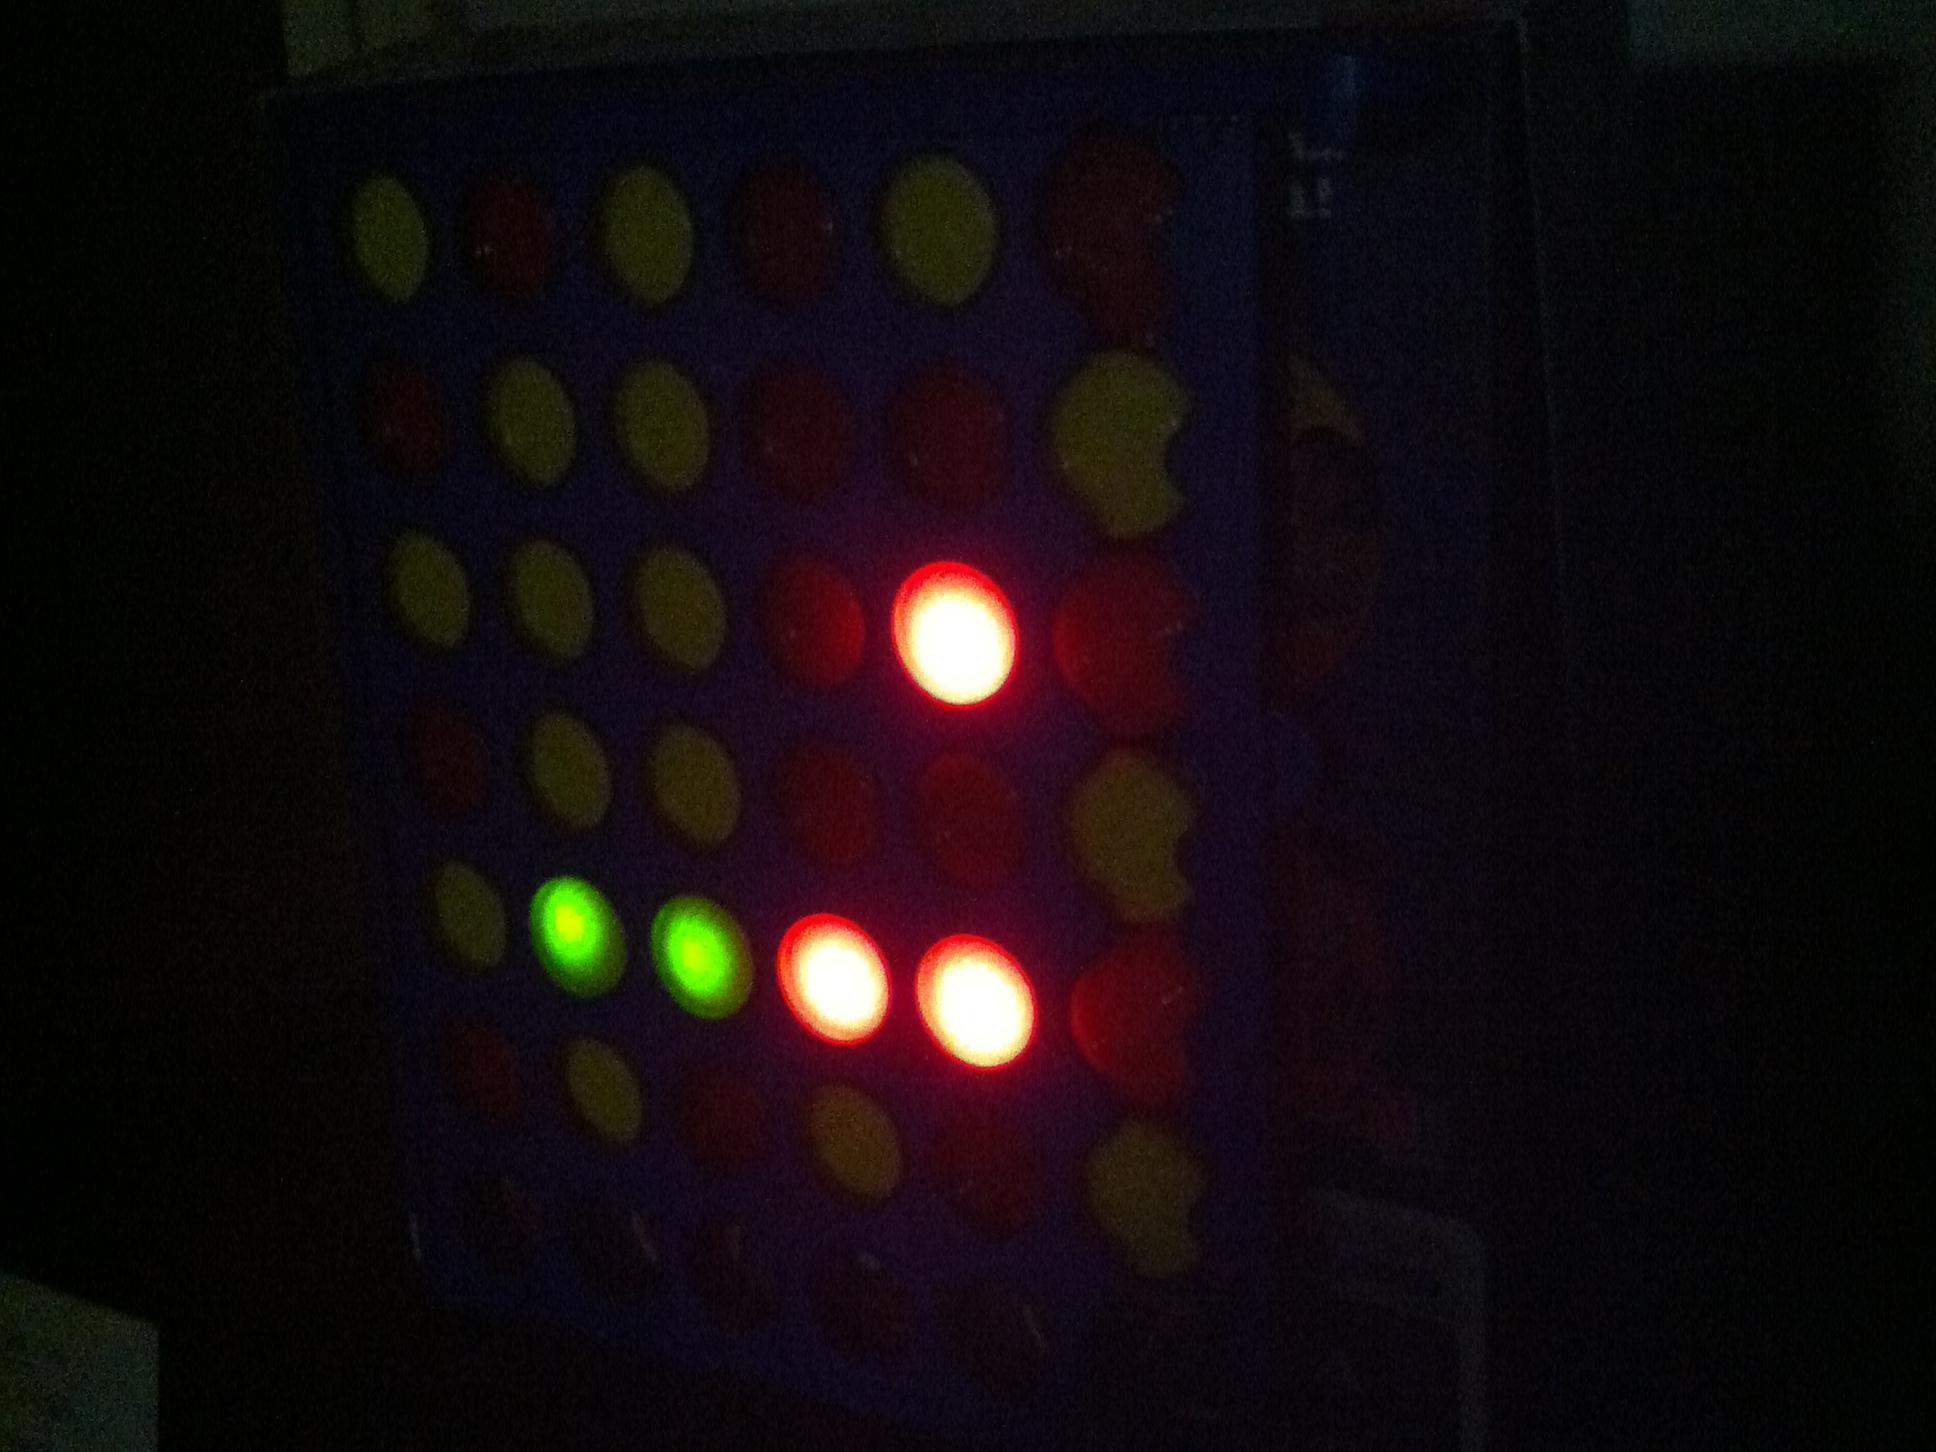 Connect 4 BinaryClock